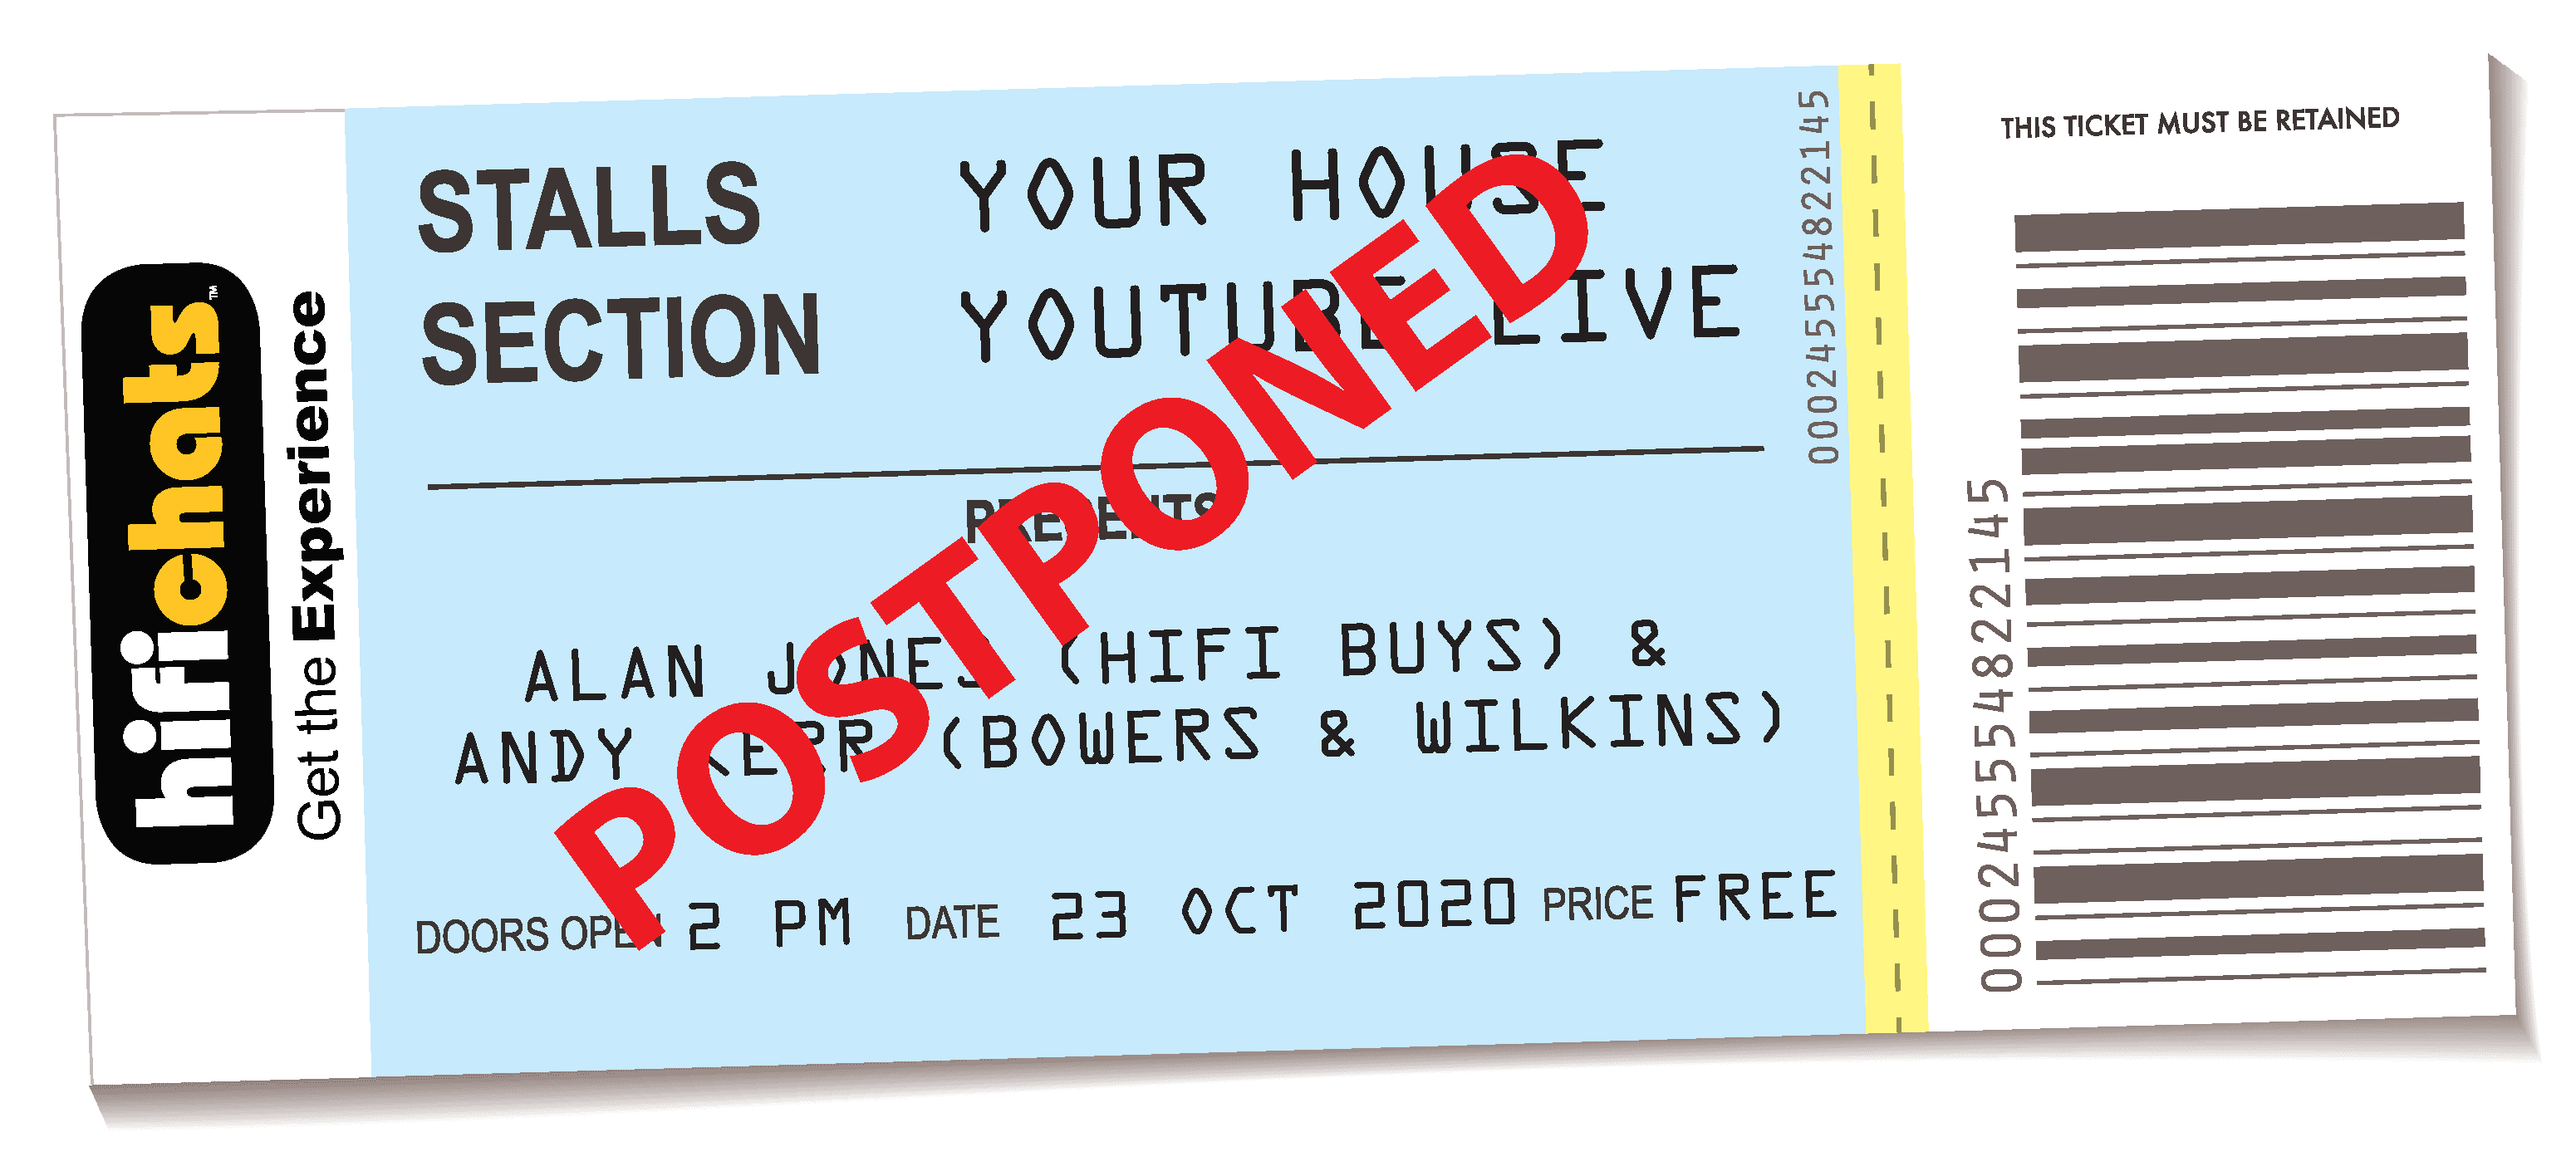 HFC Ticket B&W postponed cropped